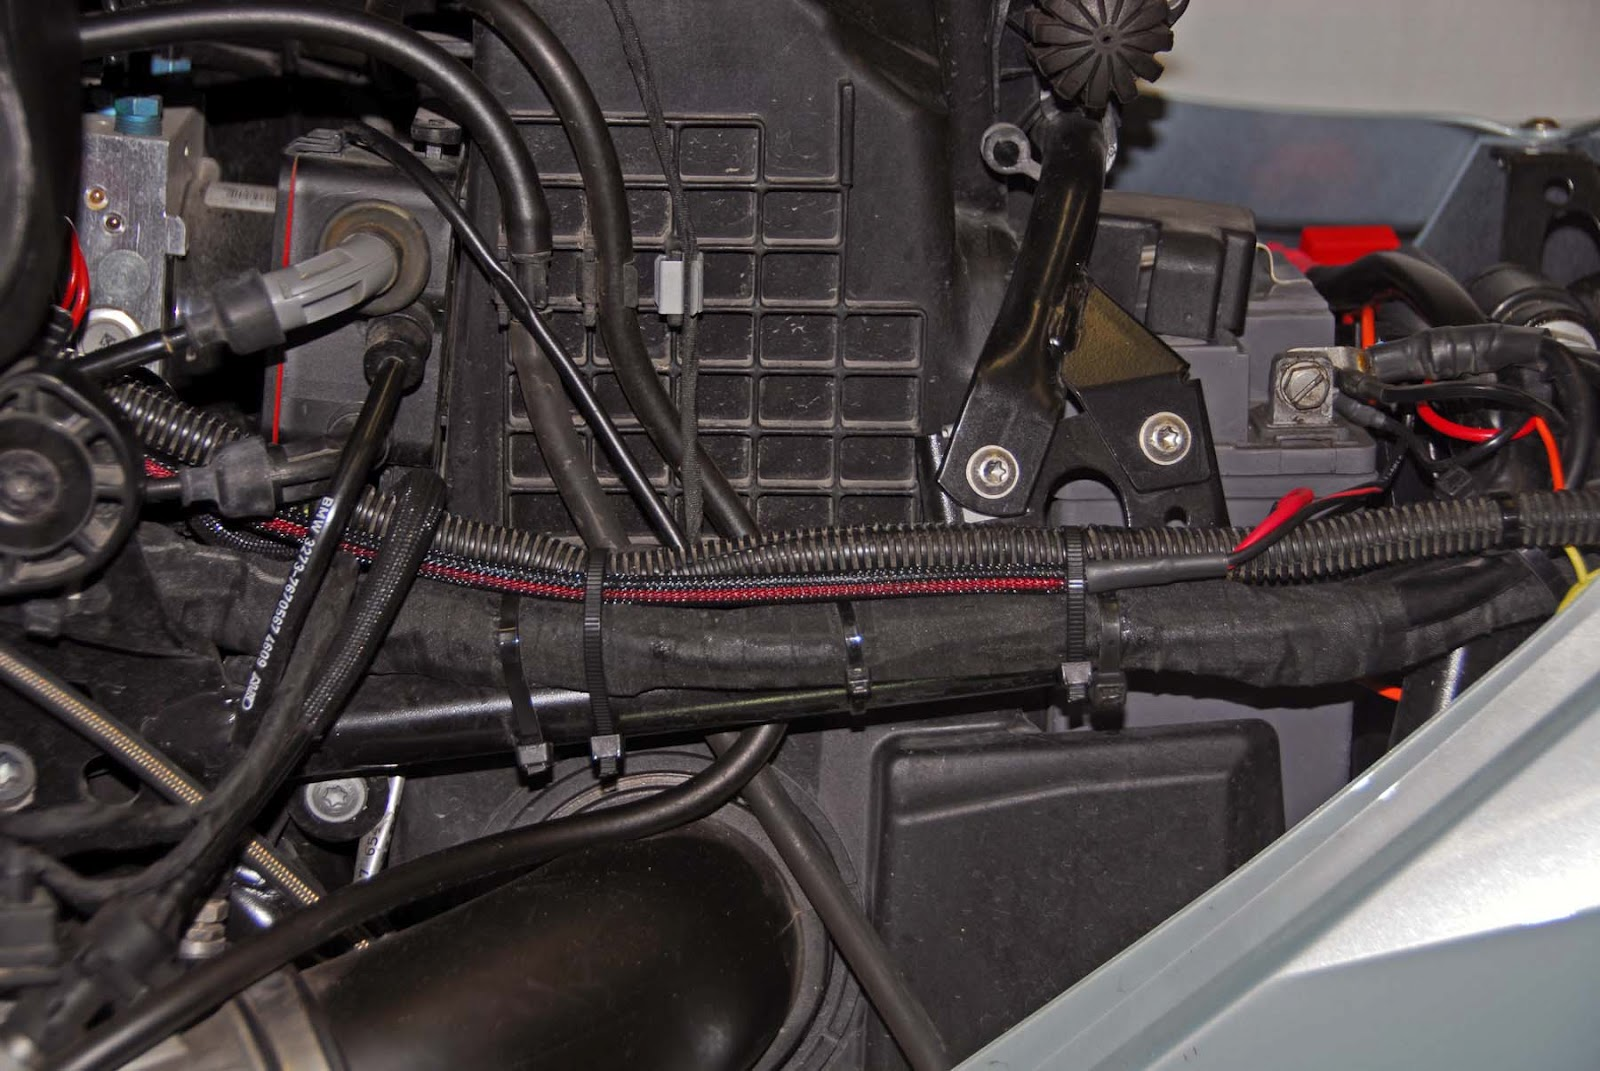 Blaine U0026 39 S 2010 R1200rt  Clearwater Glenda Led Install On